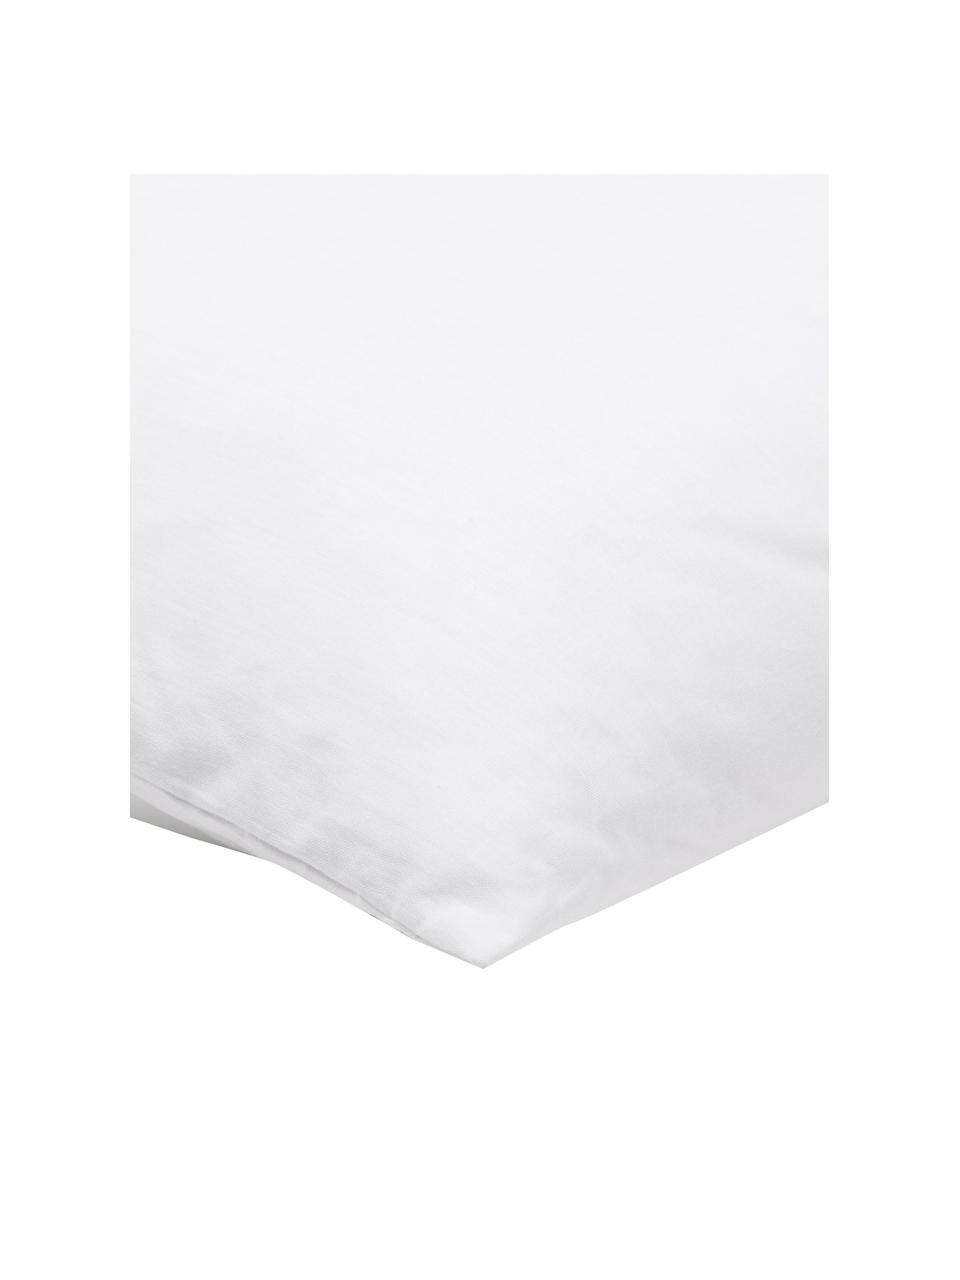 Microfiber kussenvulling Sia, 50 x 50 cm, Wit, 50 x 50 cm